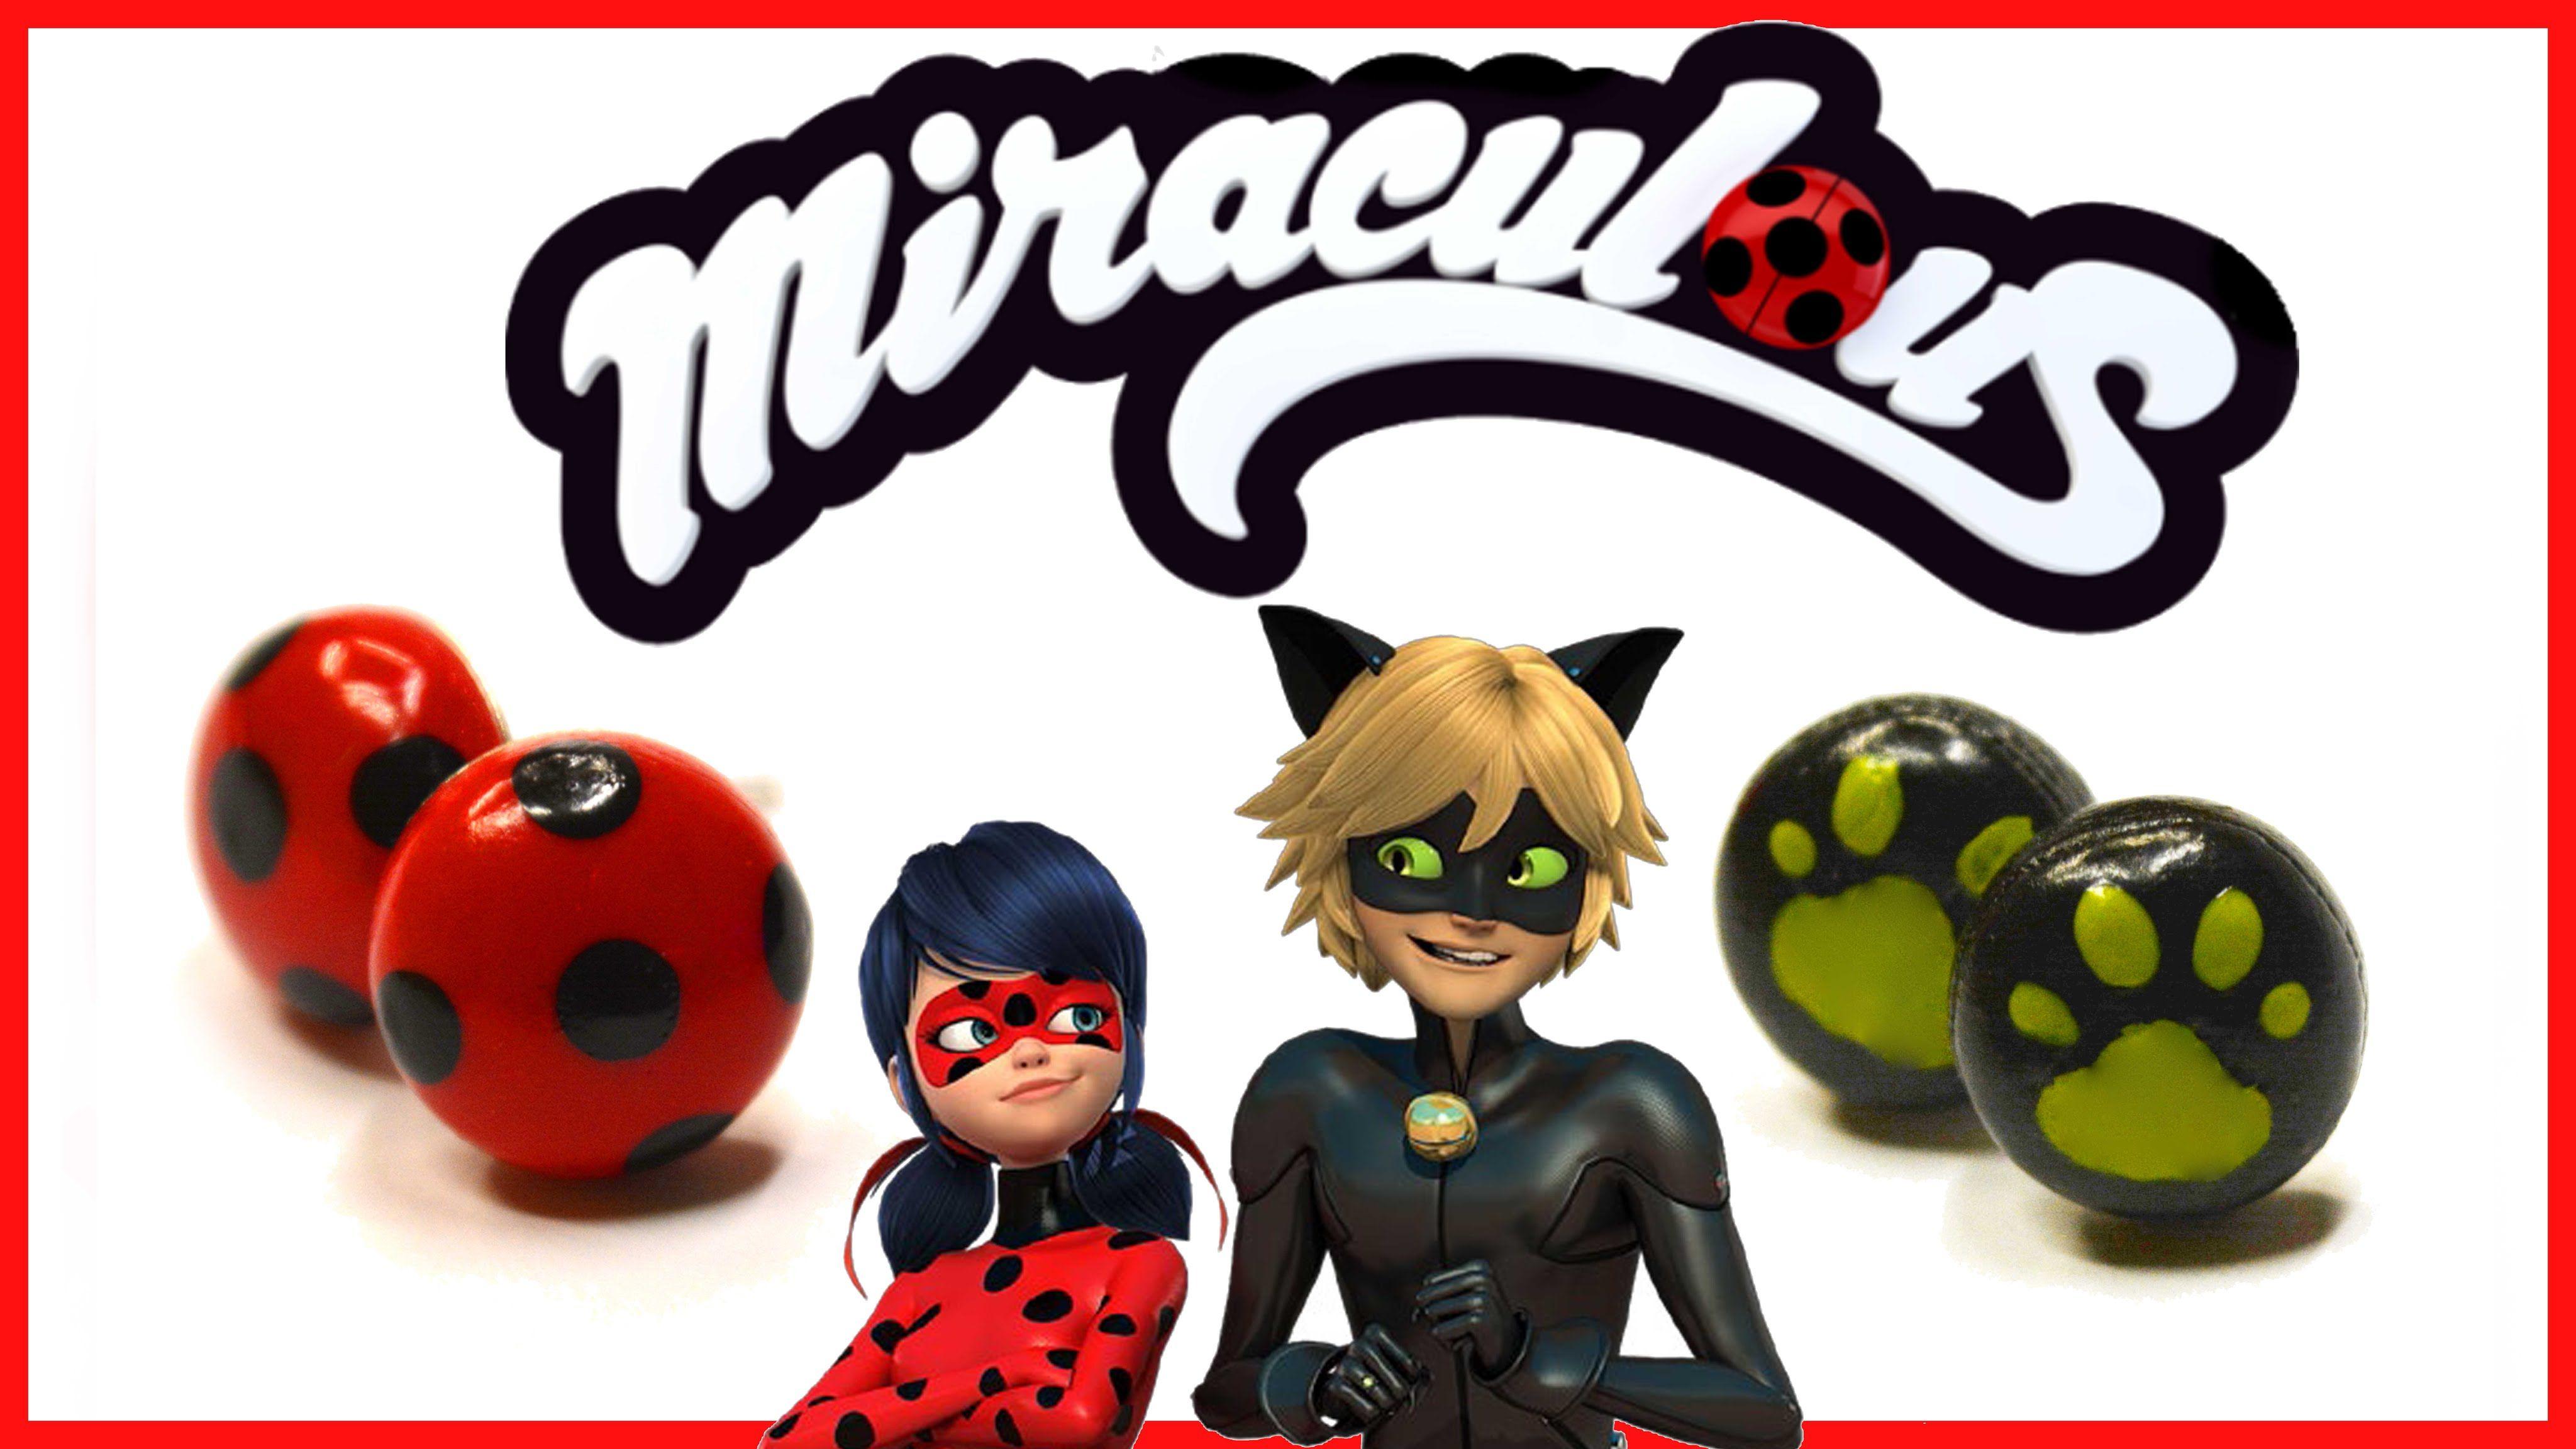 Miraculous Ladybug Earrings Chat Noir Earrings Polymer Clay Tutorial Ladybug Miraculous Ladybug Ladybug And Chat Noir